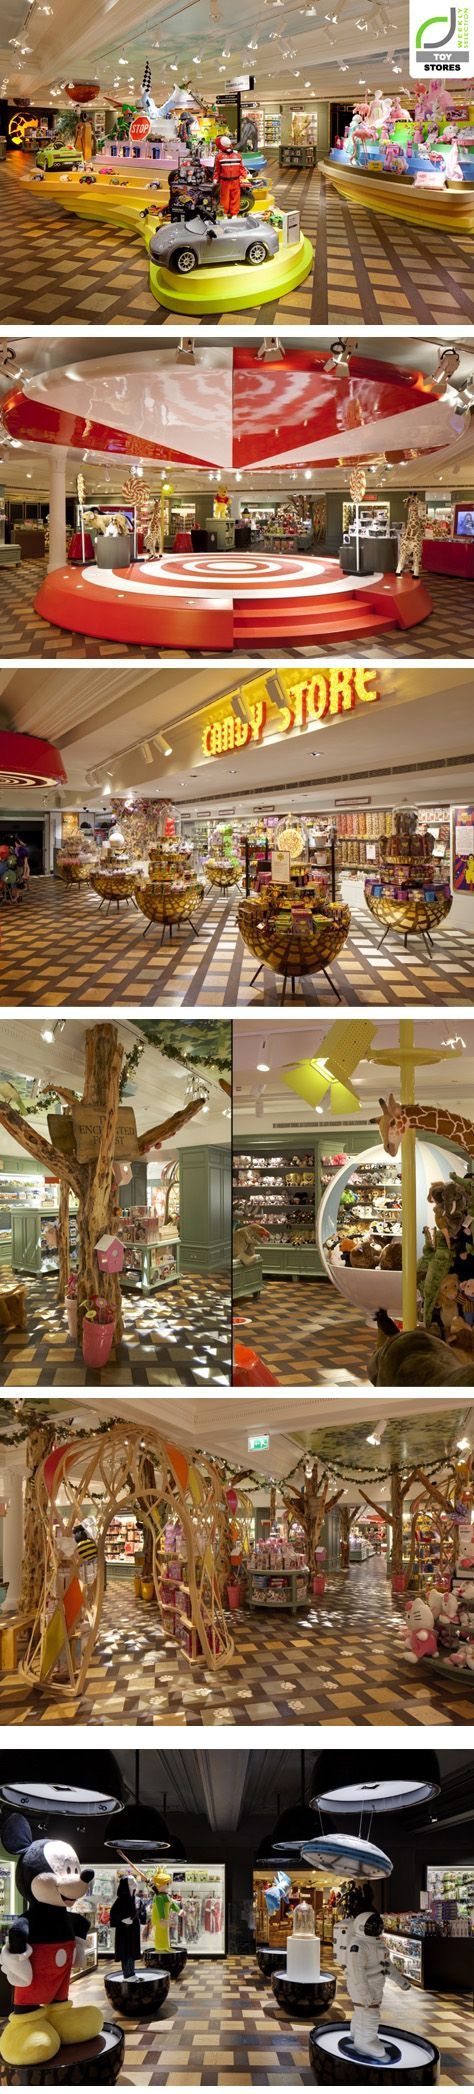 Harrods Toy Kingdom by Shed, London